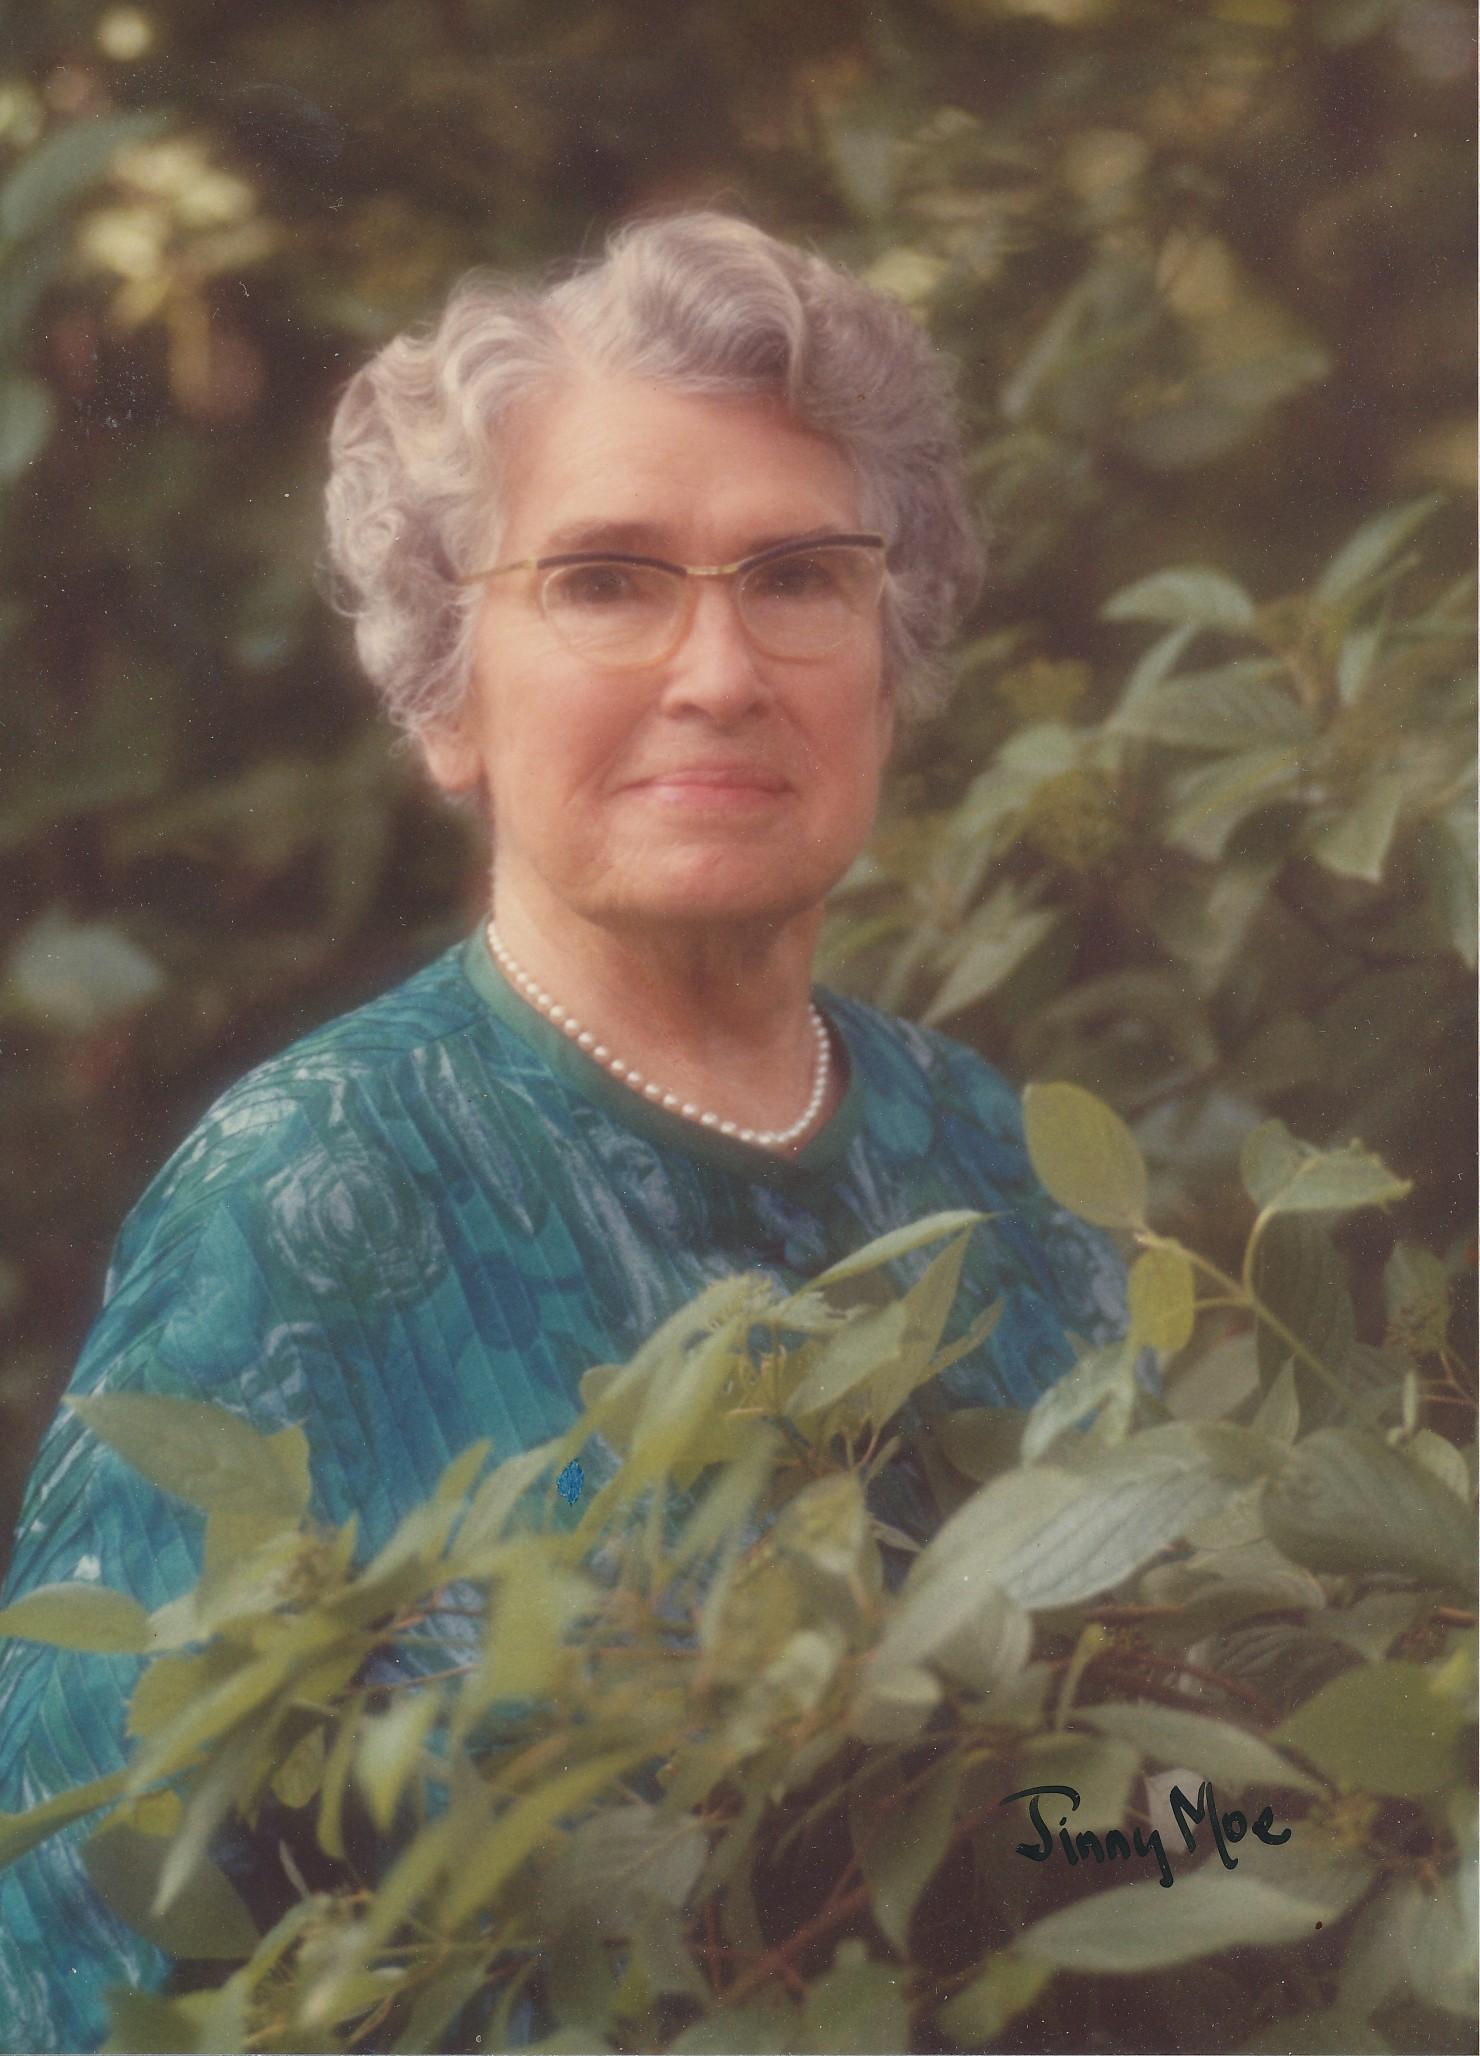 Marjorie in 1965 looking stunning in a blue print top.